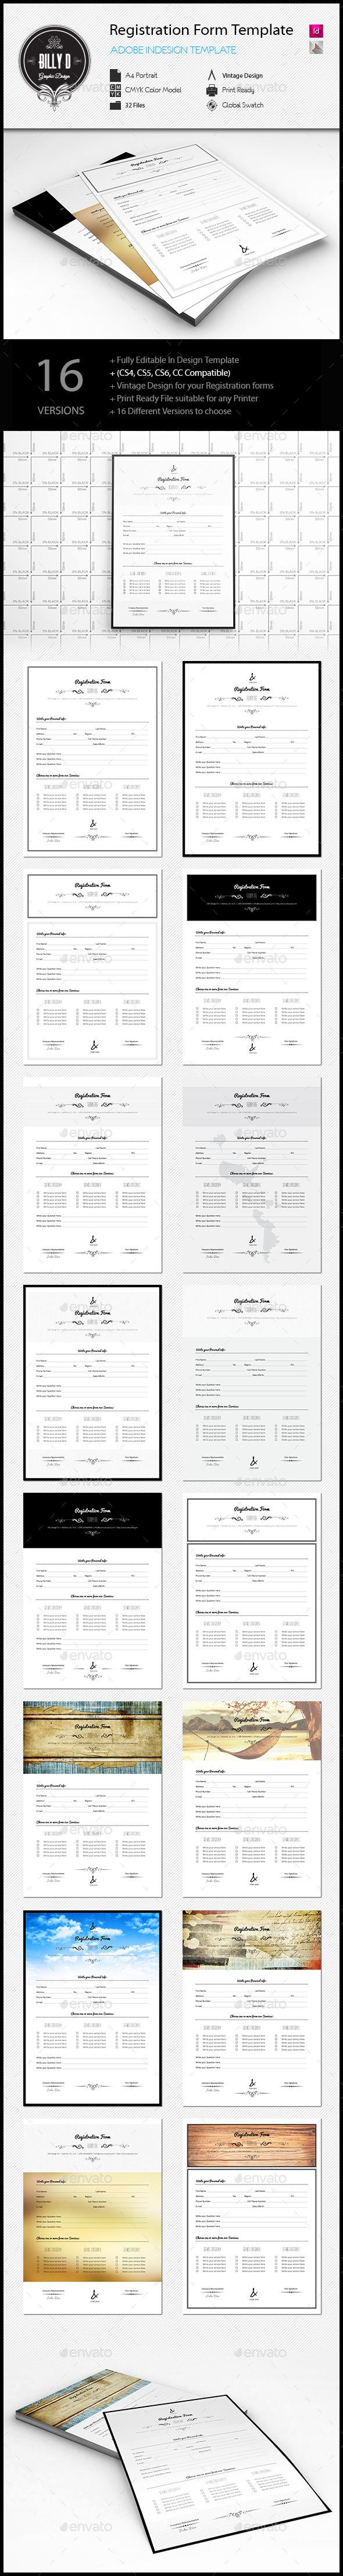 Registration Form Template | Registration form, Template and Print ...